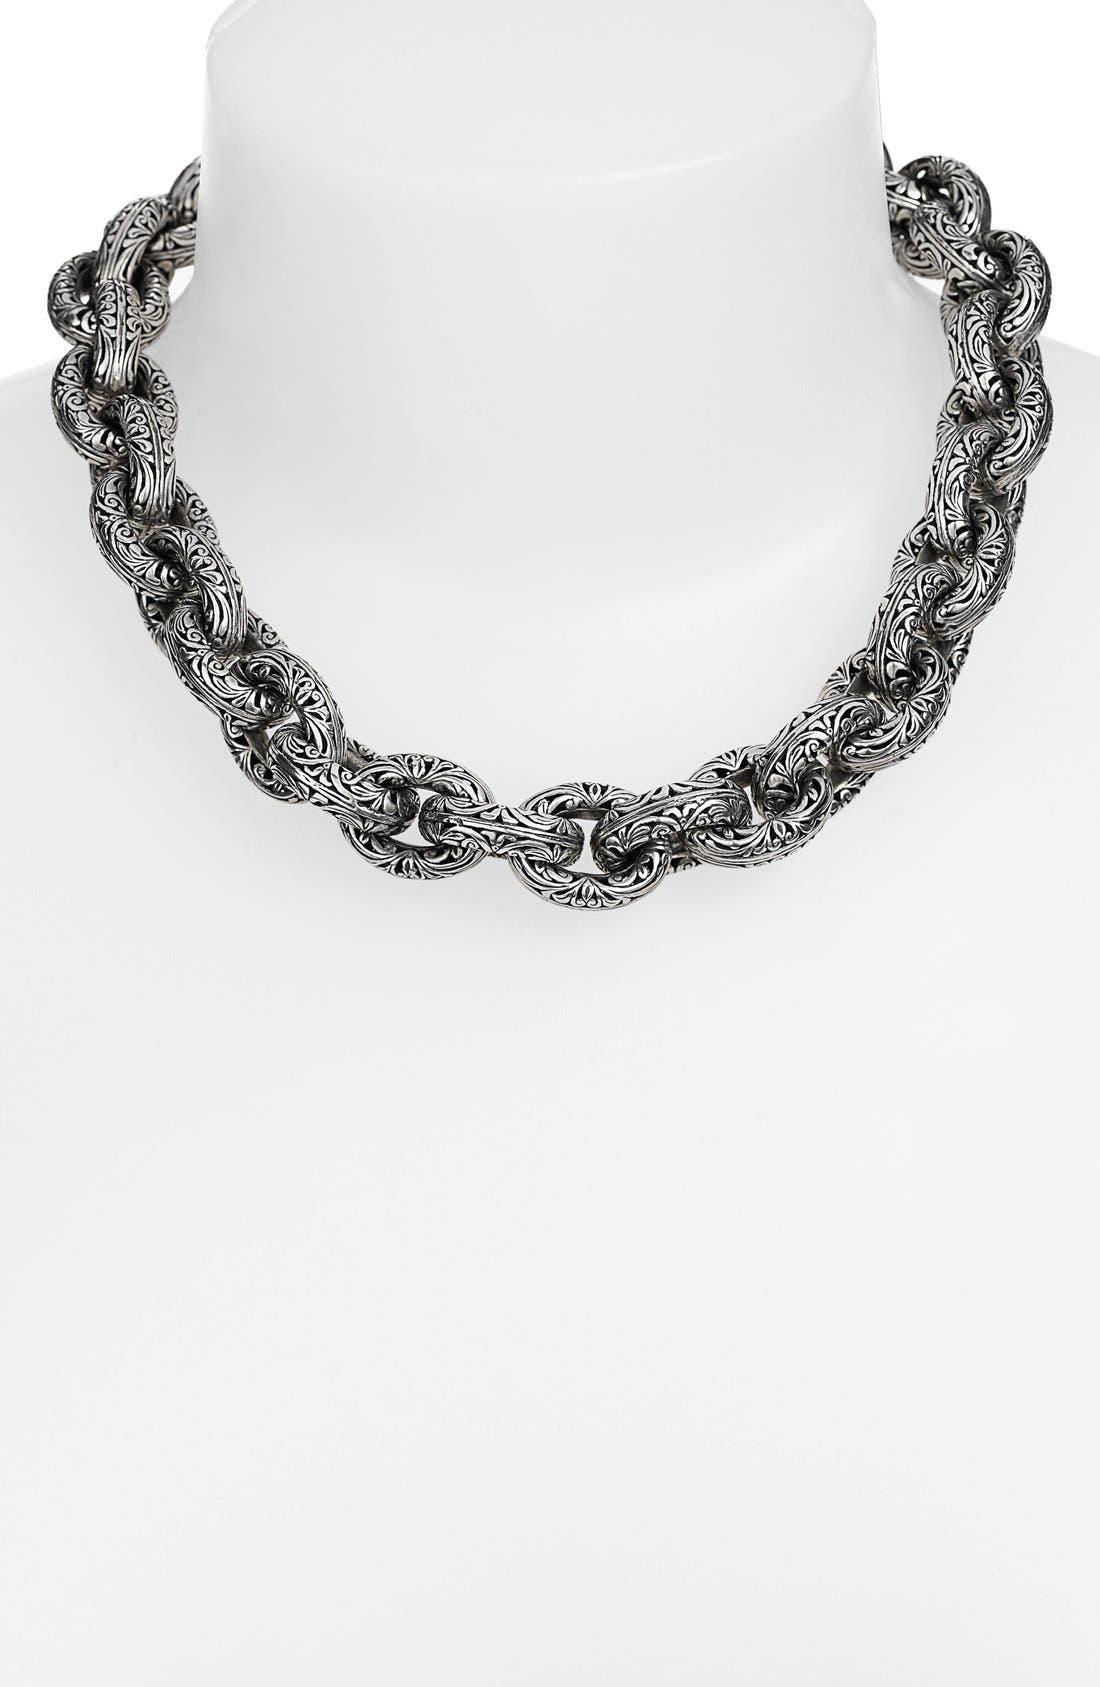 Konstantino 'Classics' Link Collar Necklace